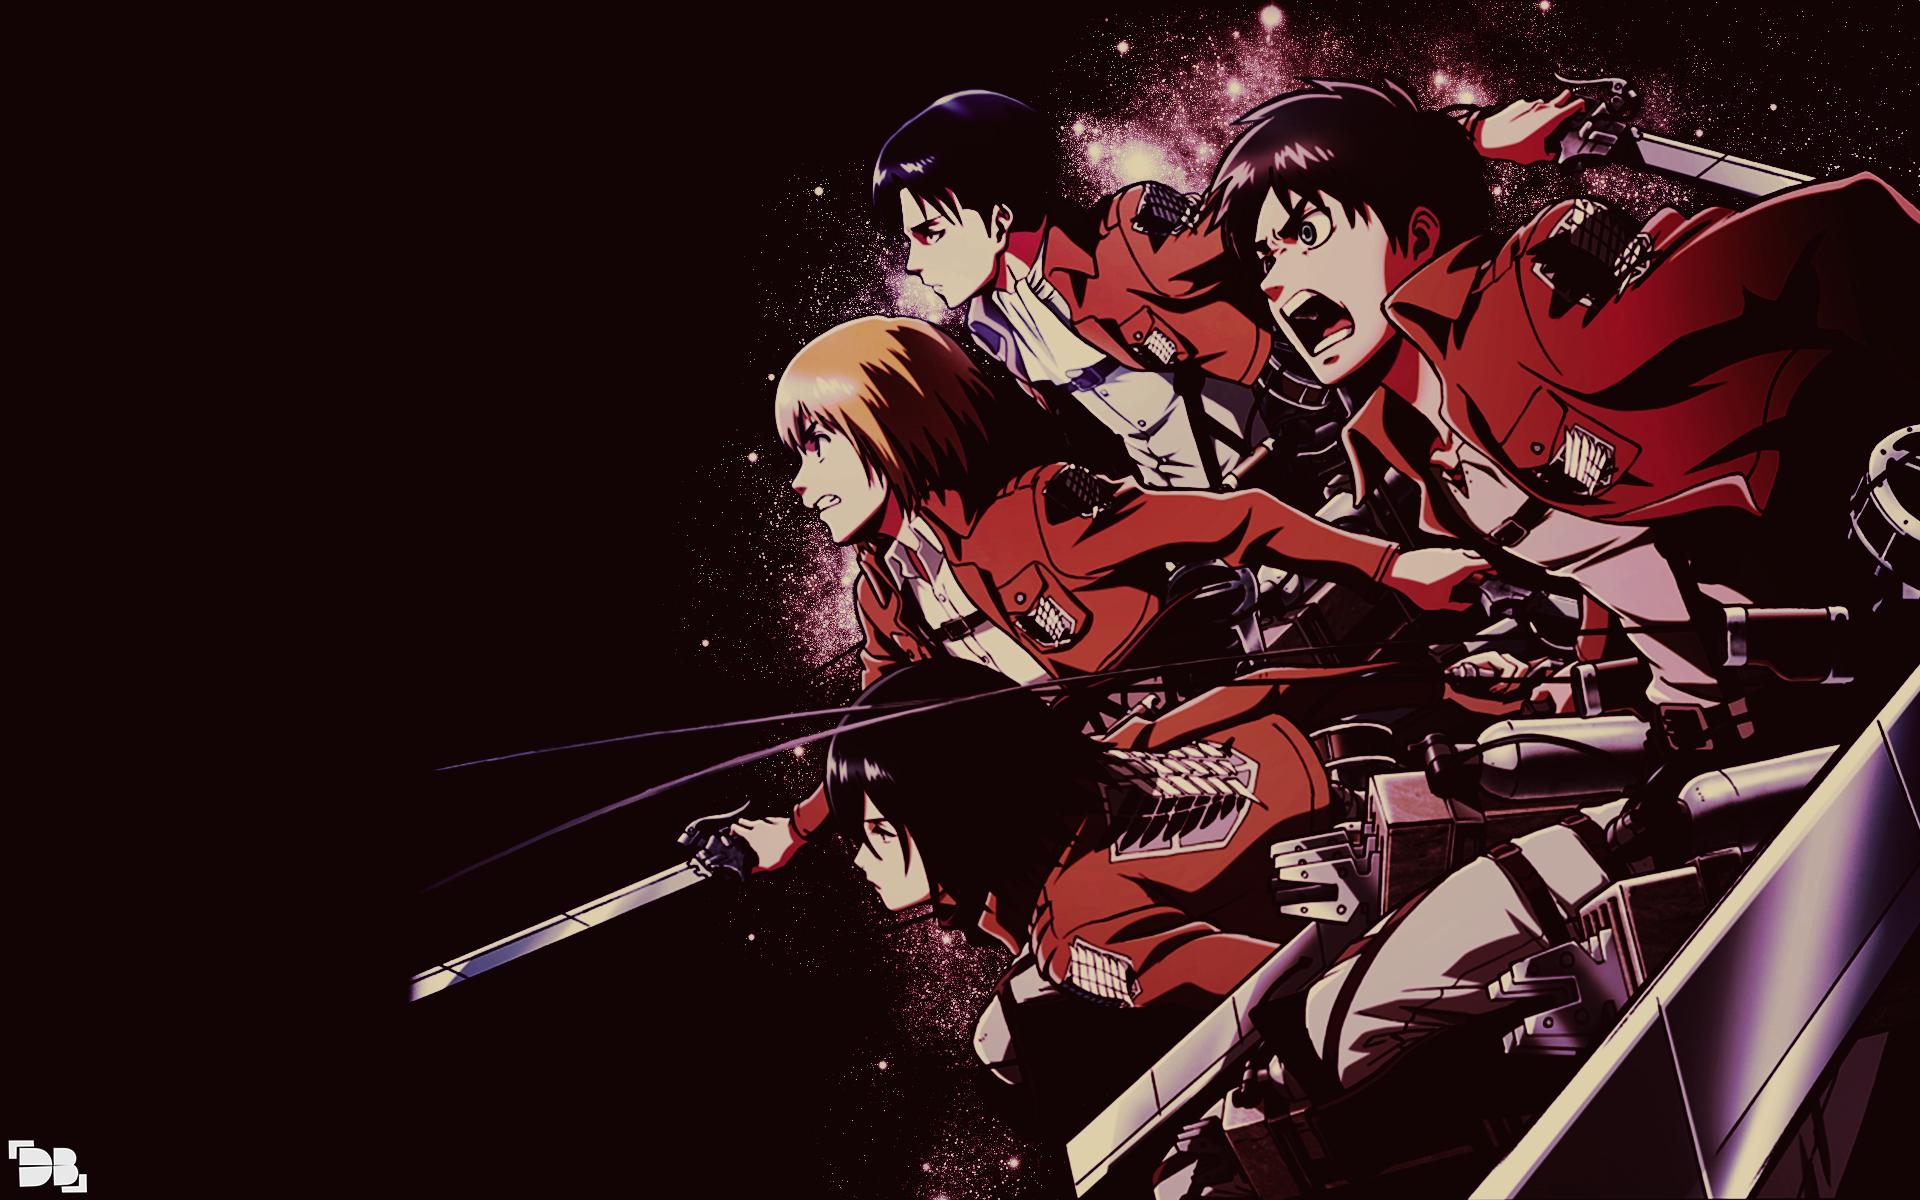 Shingeki no Kyojin Wallpaper 3 by DeathB00K on DeviantArt